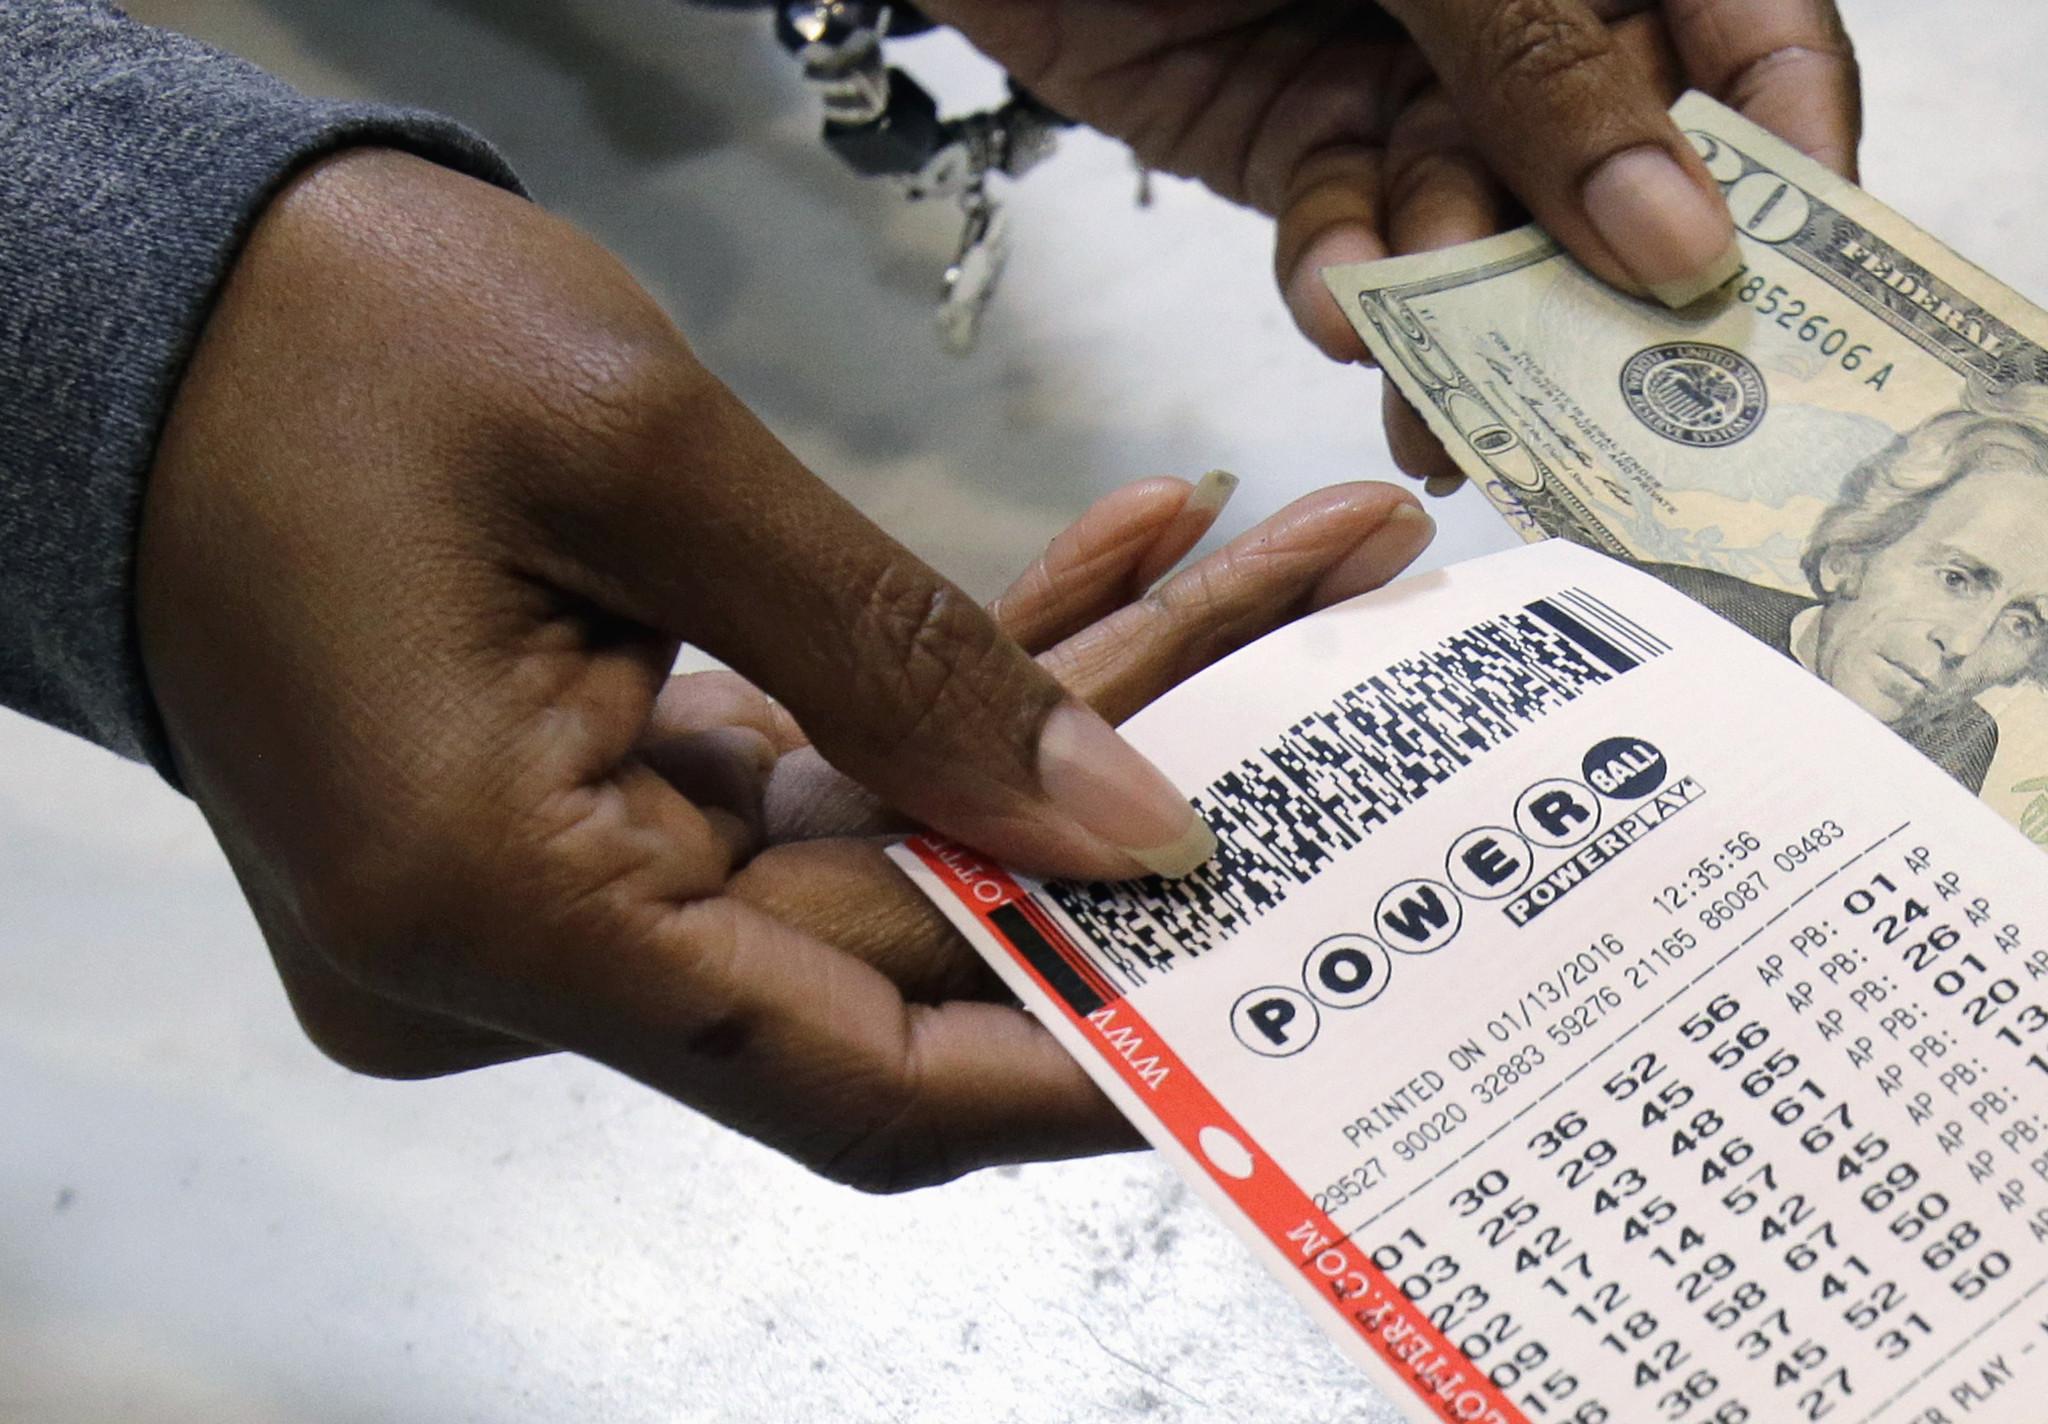 Nj cash five past winning numbers - Winning Powerball Ticket Worth 429m Sold In New Jersey Chicago Tribune